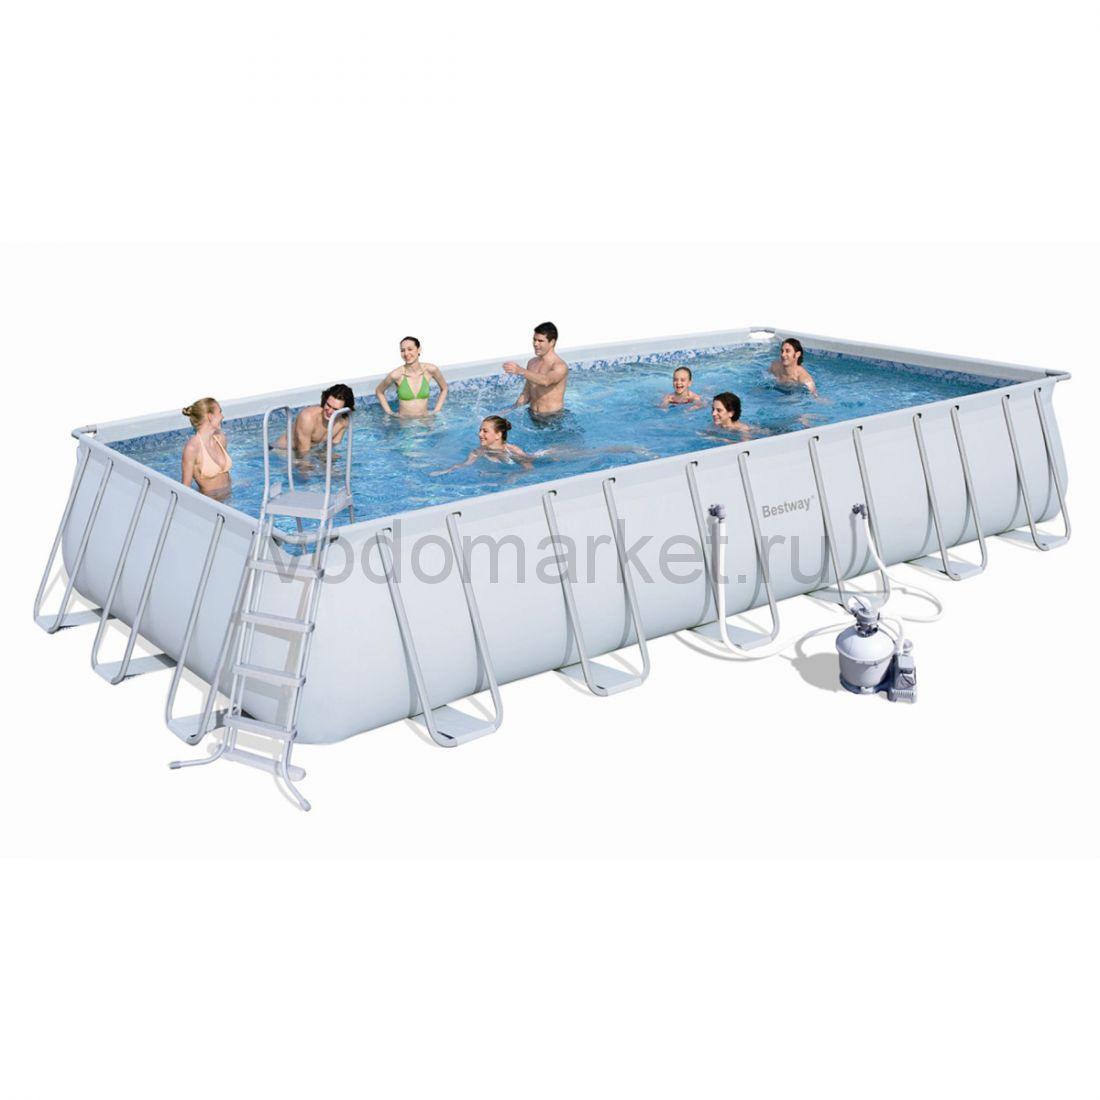 732х366х132 см (56279) Bestway Каркасный прямоугольный бассейн